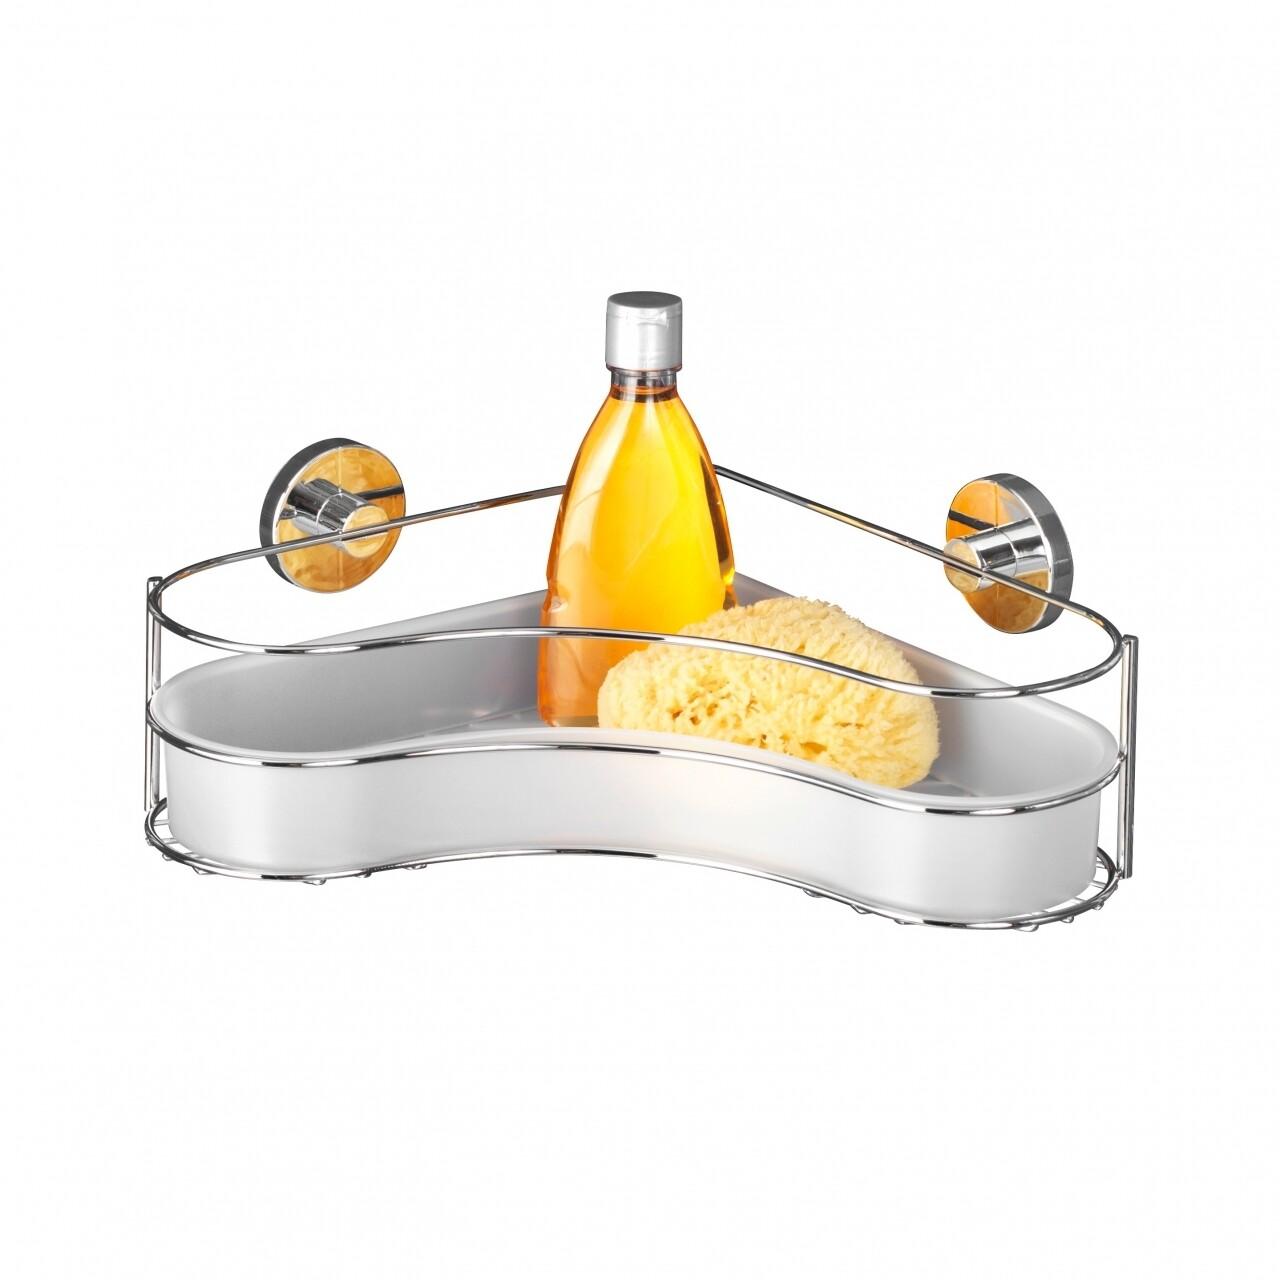 Polita de colt pentru baie WENKO Vacuum-Loc® Milazzo, 24 x 35 x 11.5 cm, otel, argintiu